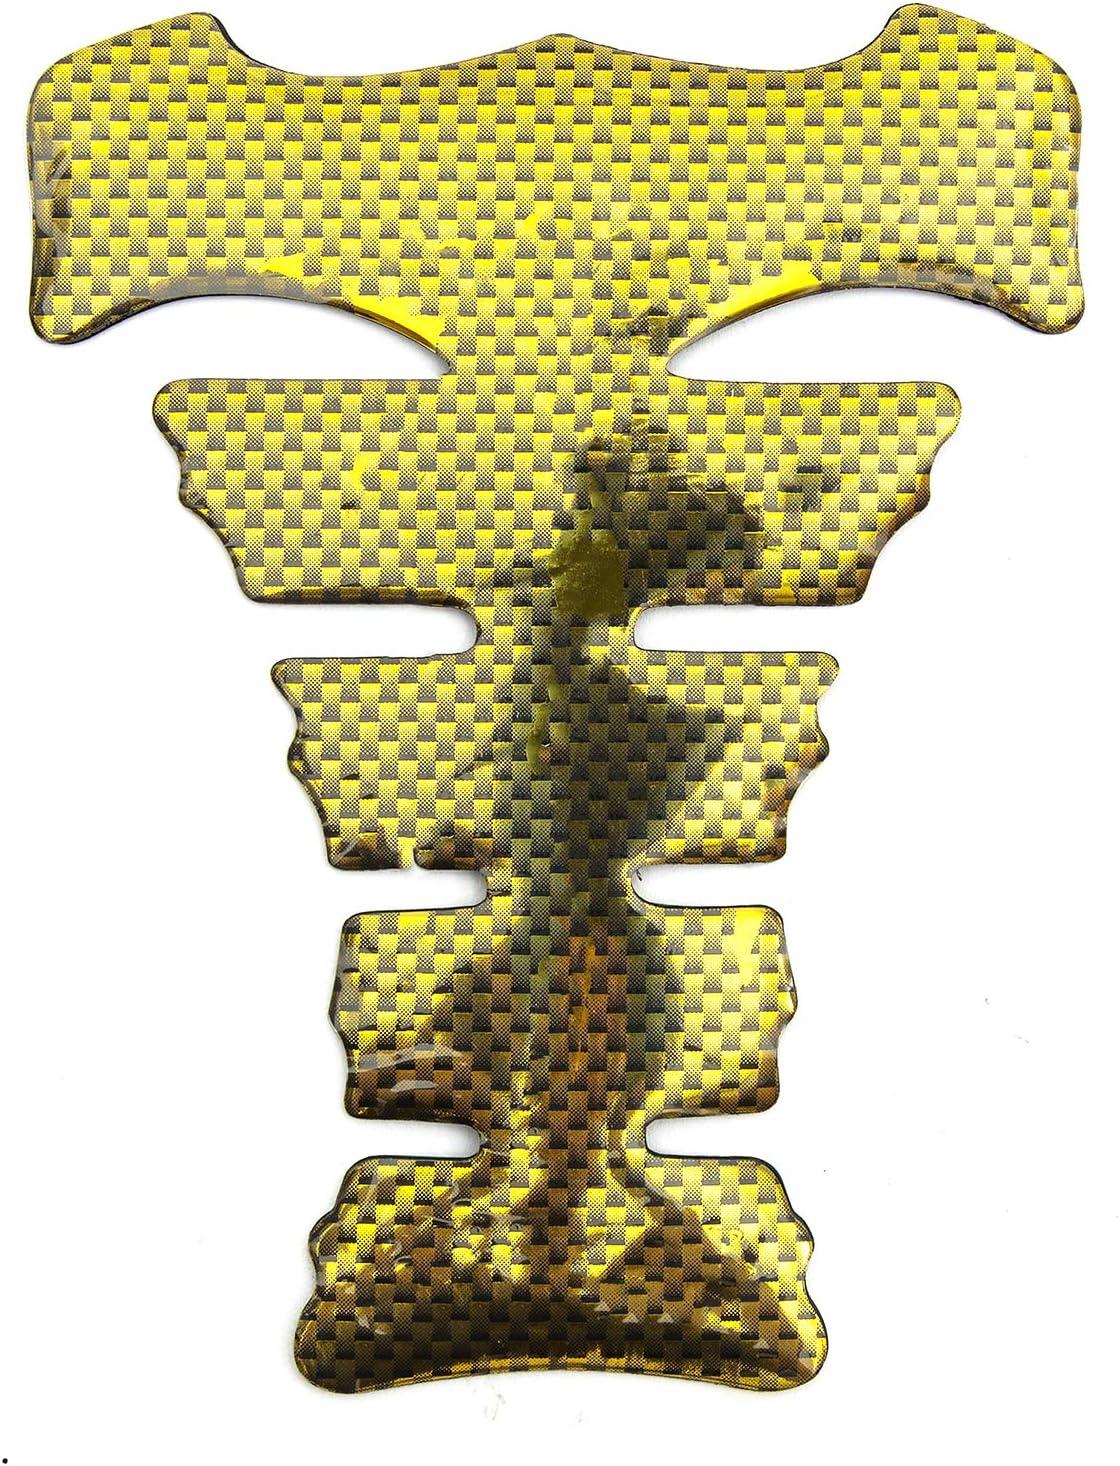 Metallic Gold Adhesive Fuel Tank Protector Pad